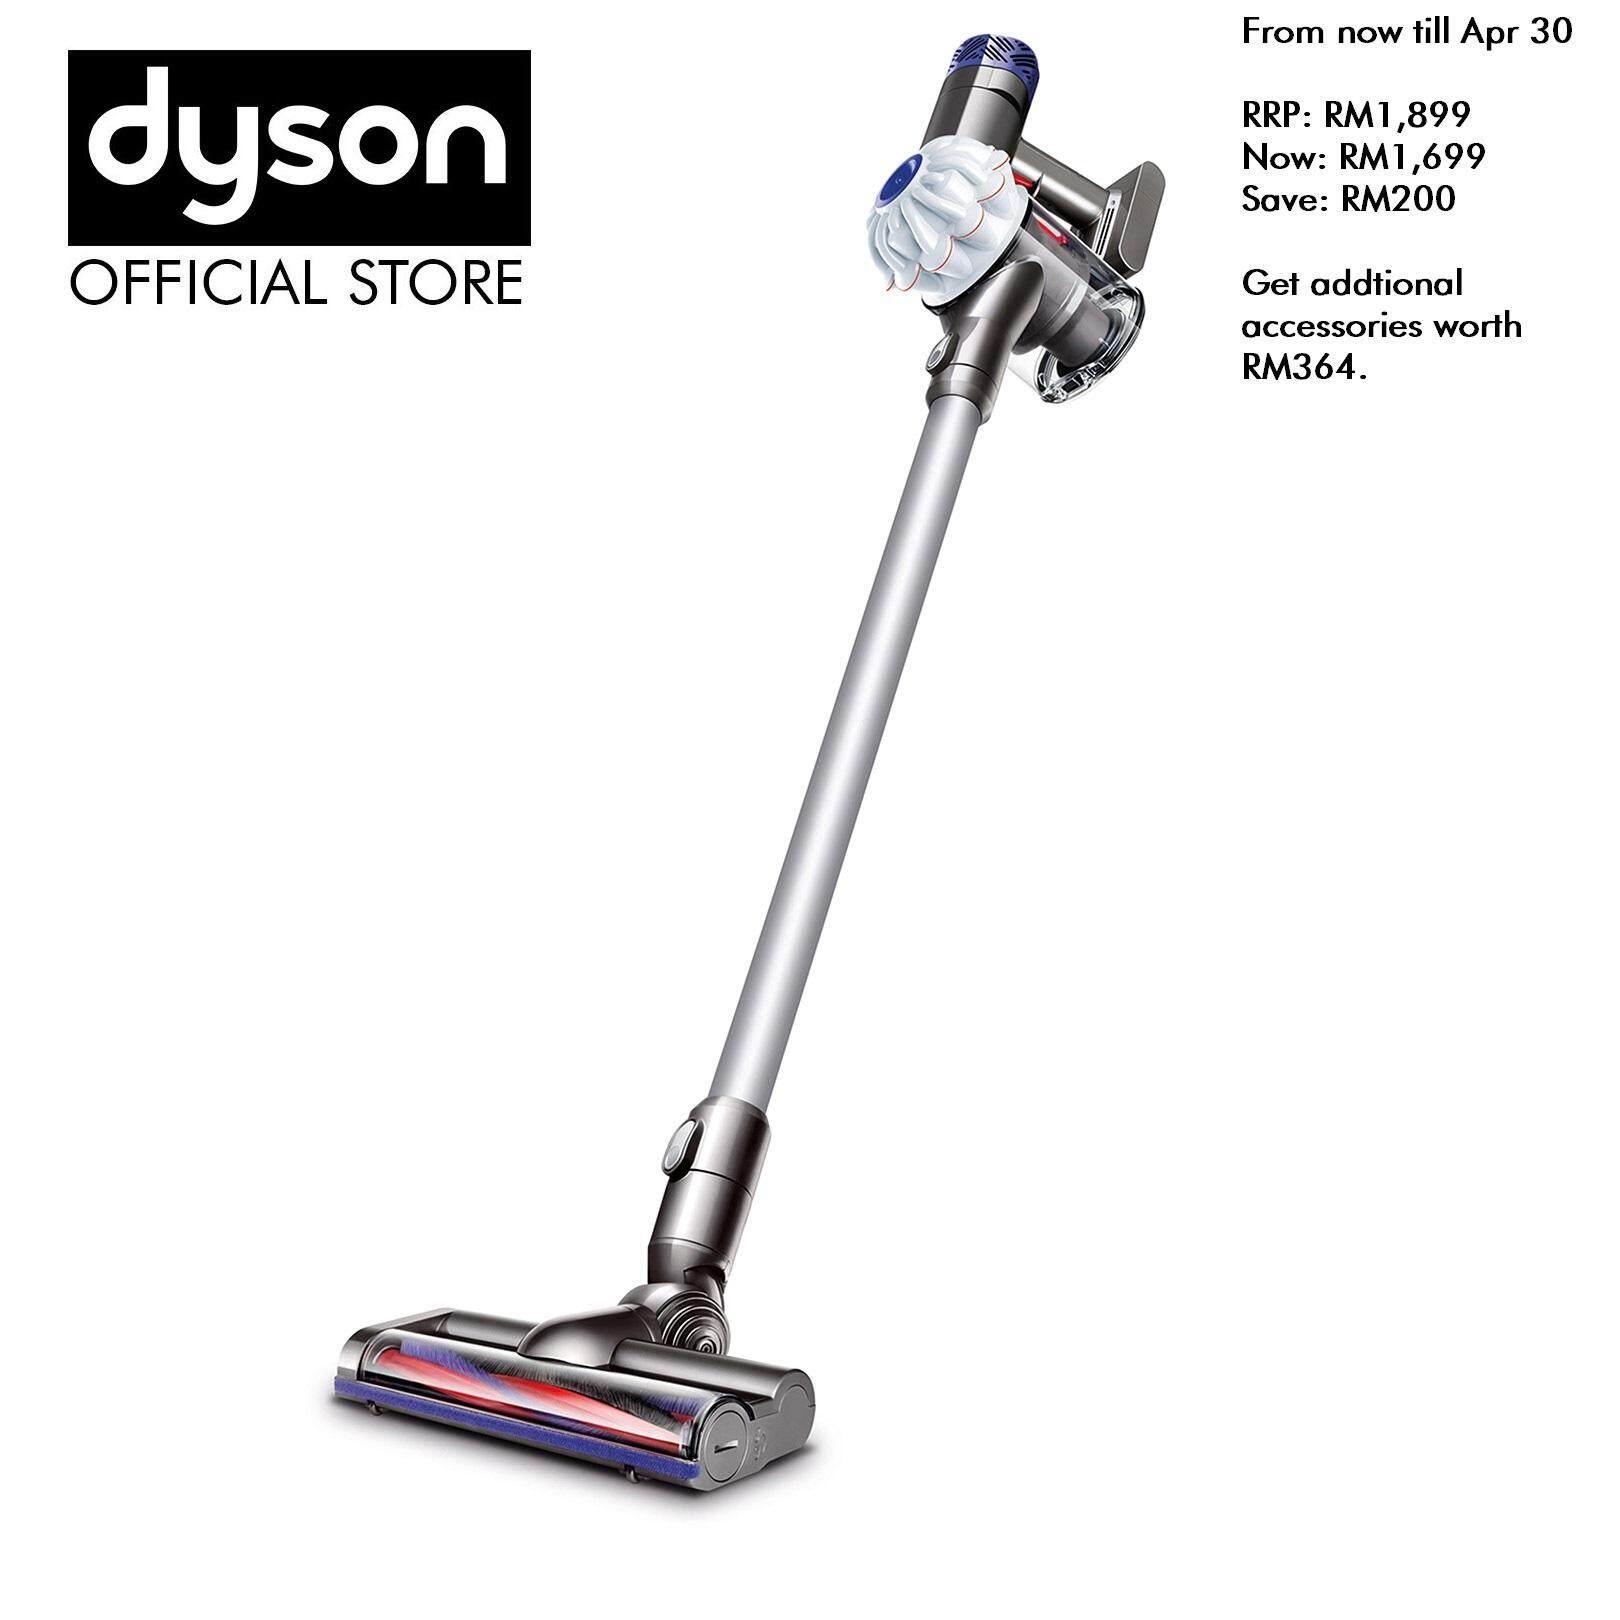 Dyson Cord Free V6 HEPA Vacuum Cleaner